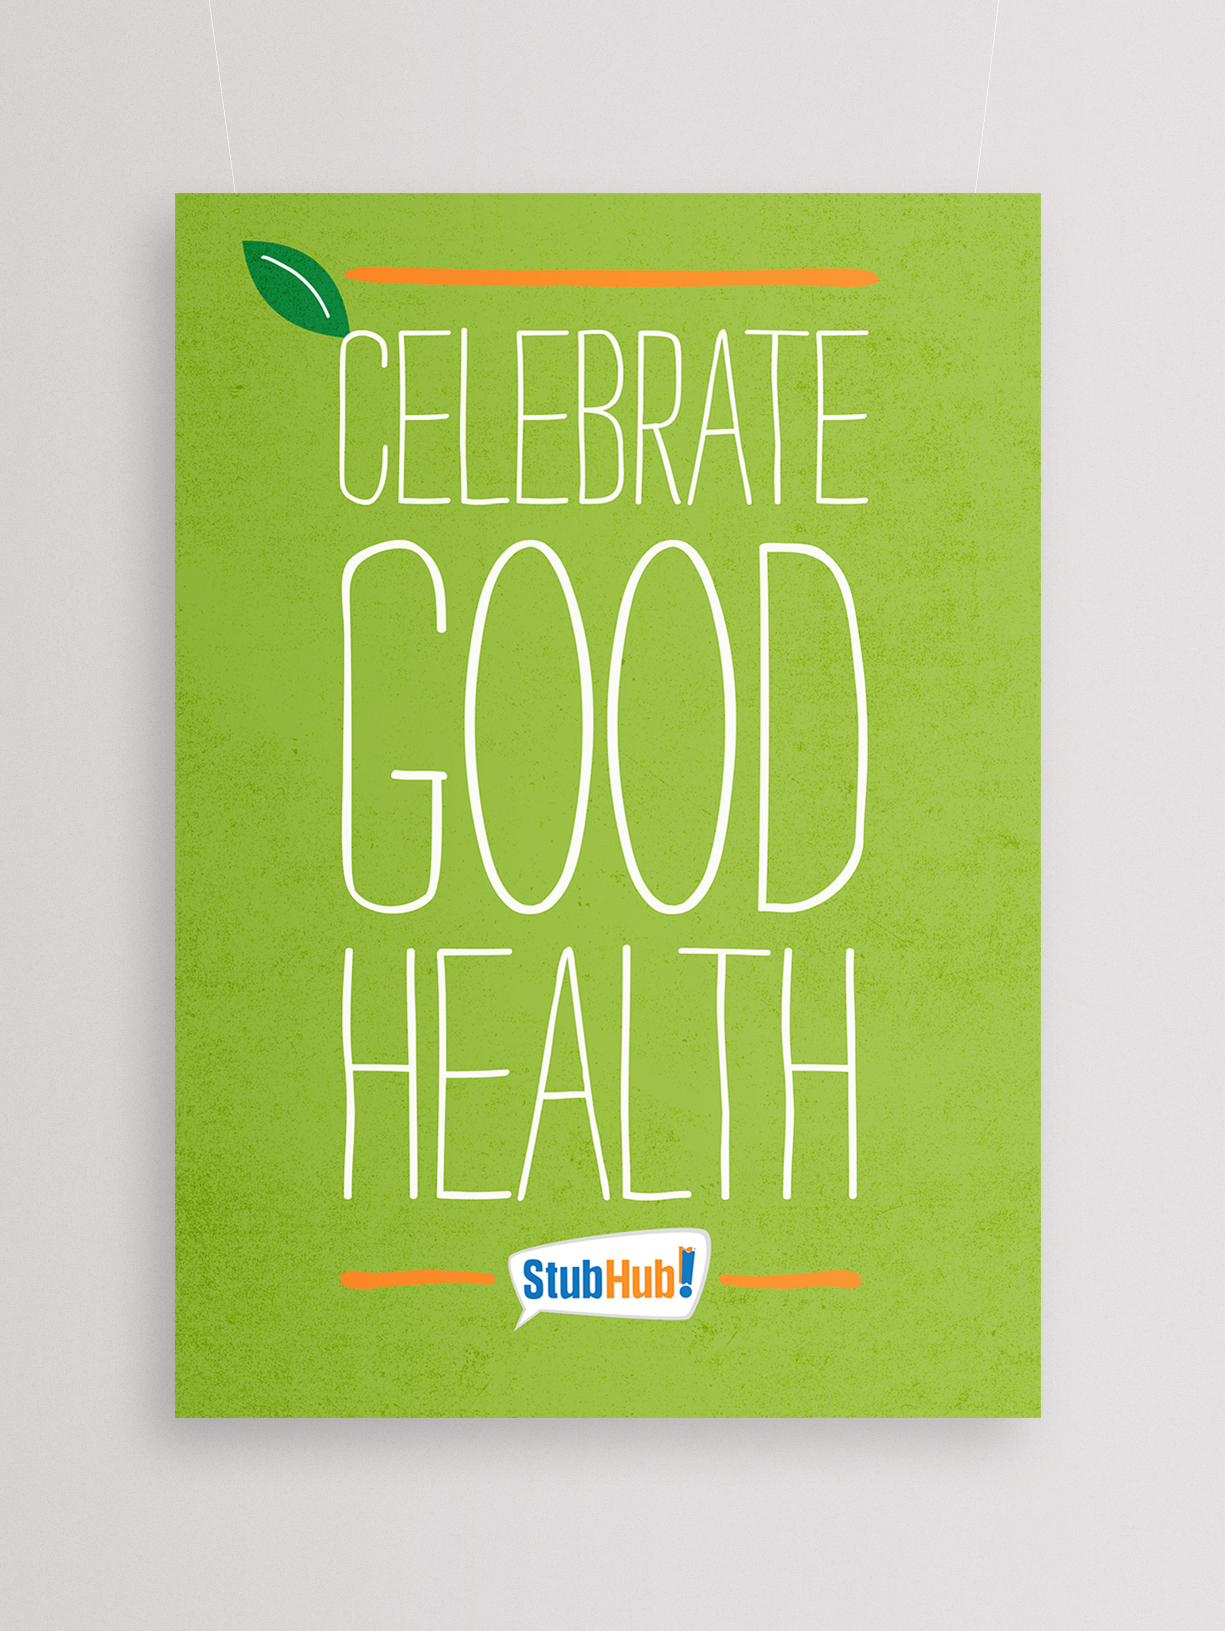 stubhub_Good-Health_Poster.jpg